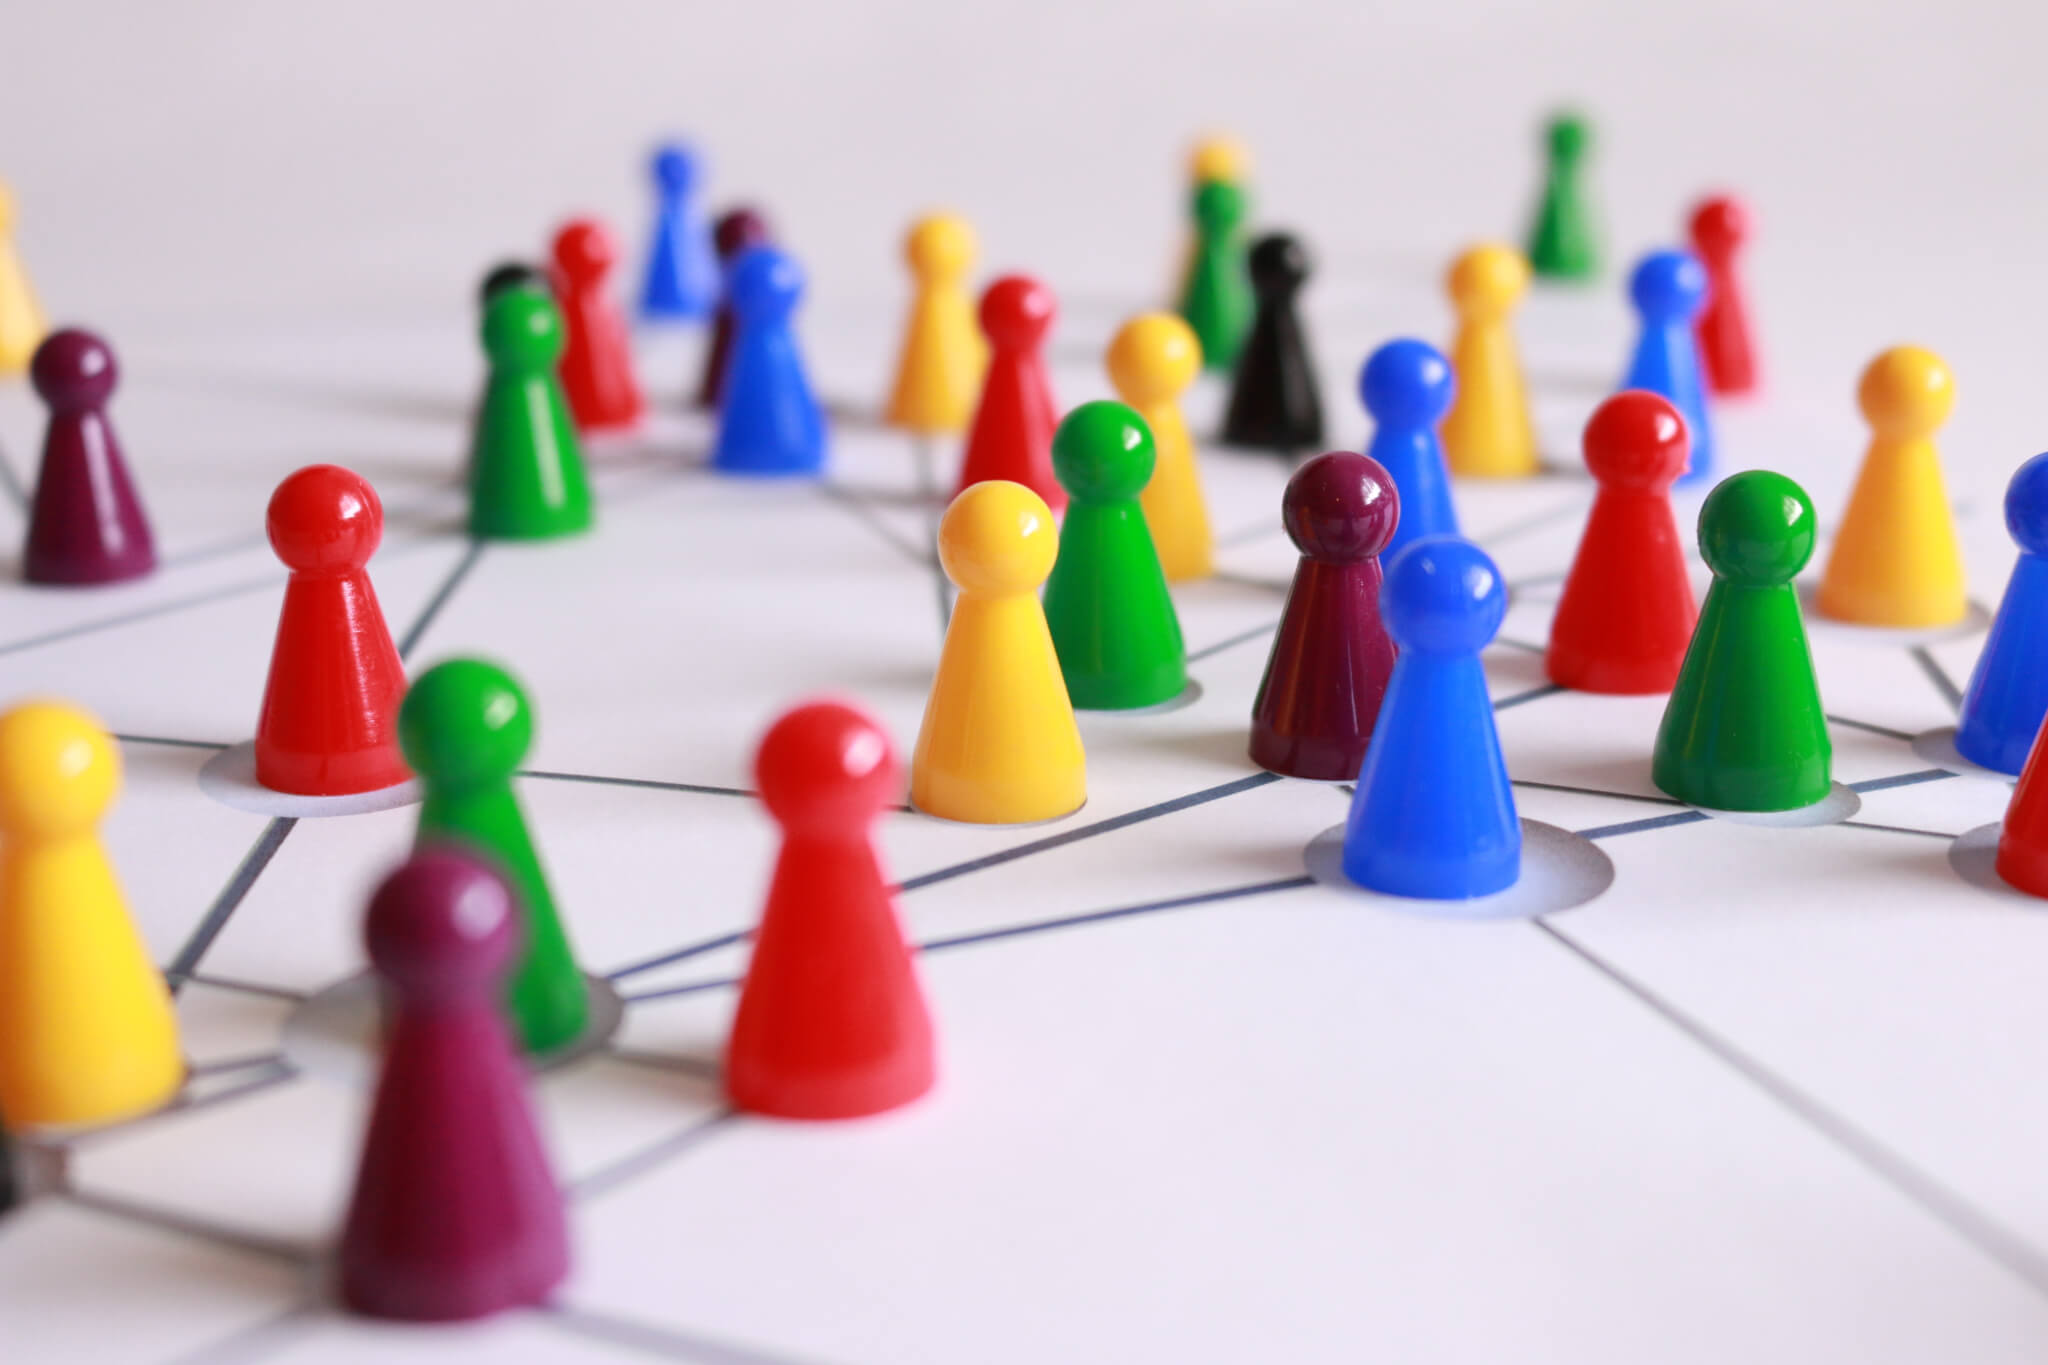 Cross-Functional Teams Can Improve Company Culture